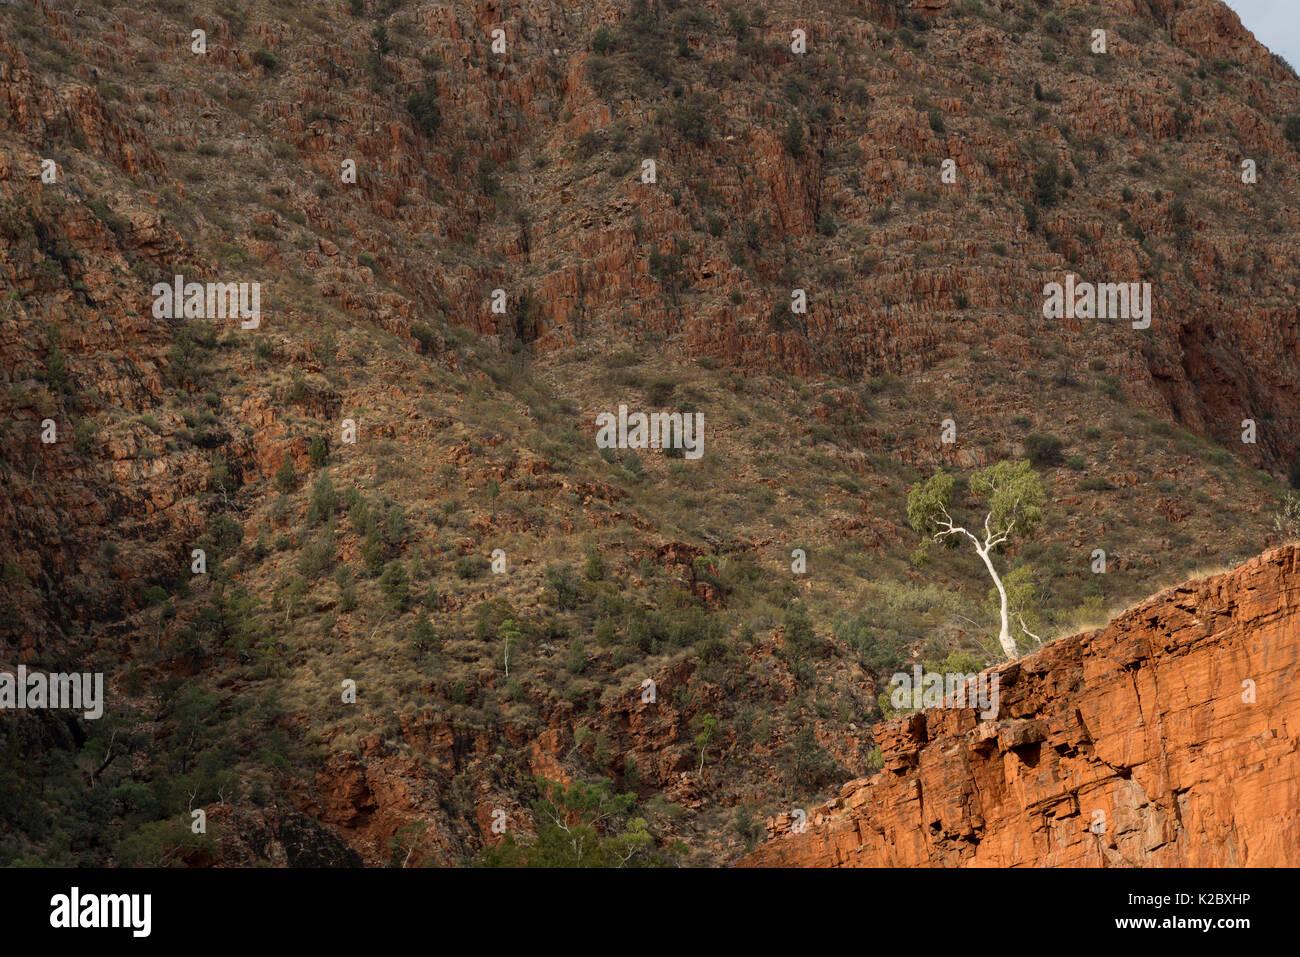 River red gum tree (Eucalyptus camaldulensis)  Redbank Gorge, West MacDonnell Ranges, Alice Springs, Northern Territory, Australia. - Stock Image